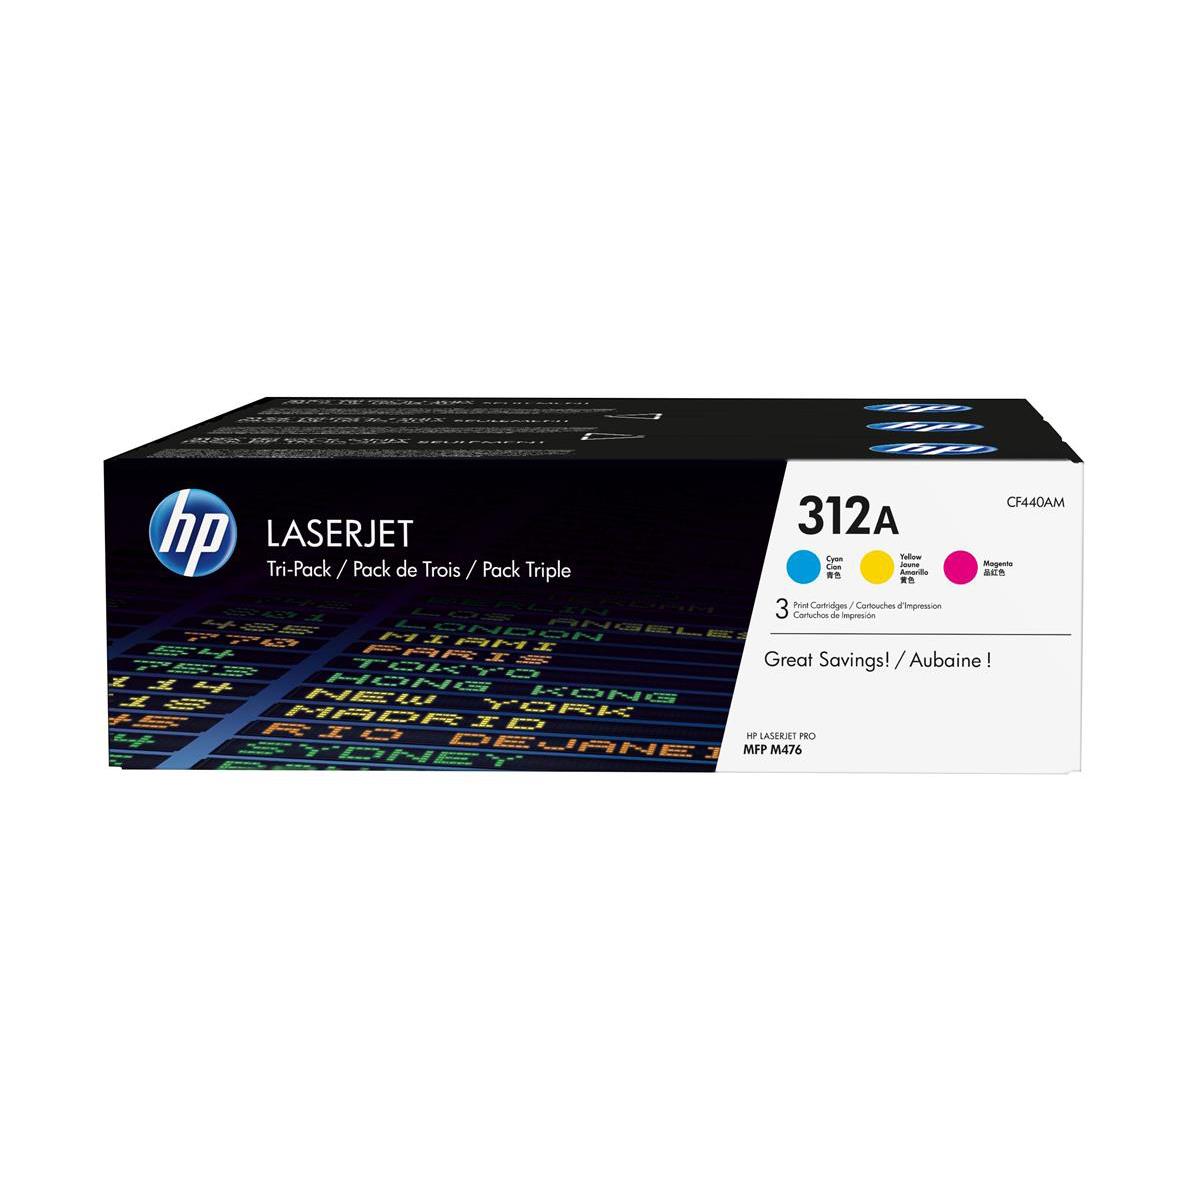 HP 312A Laser Toner Carts Page Life 2700pp Cyan/Magenta/Yellow Ref CF440AM [Pack 3]